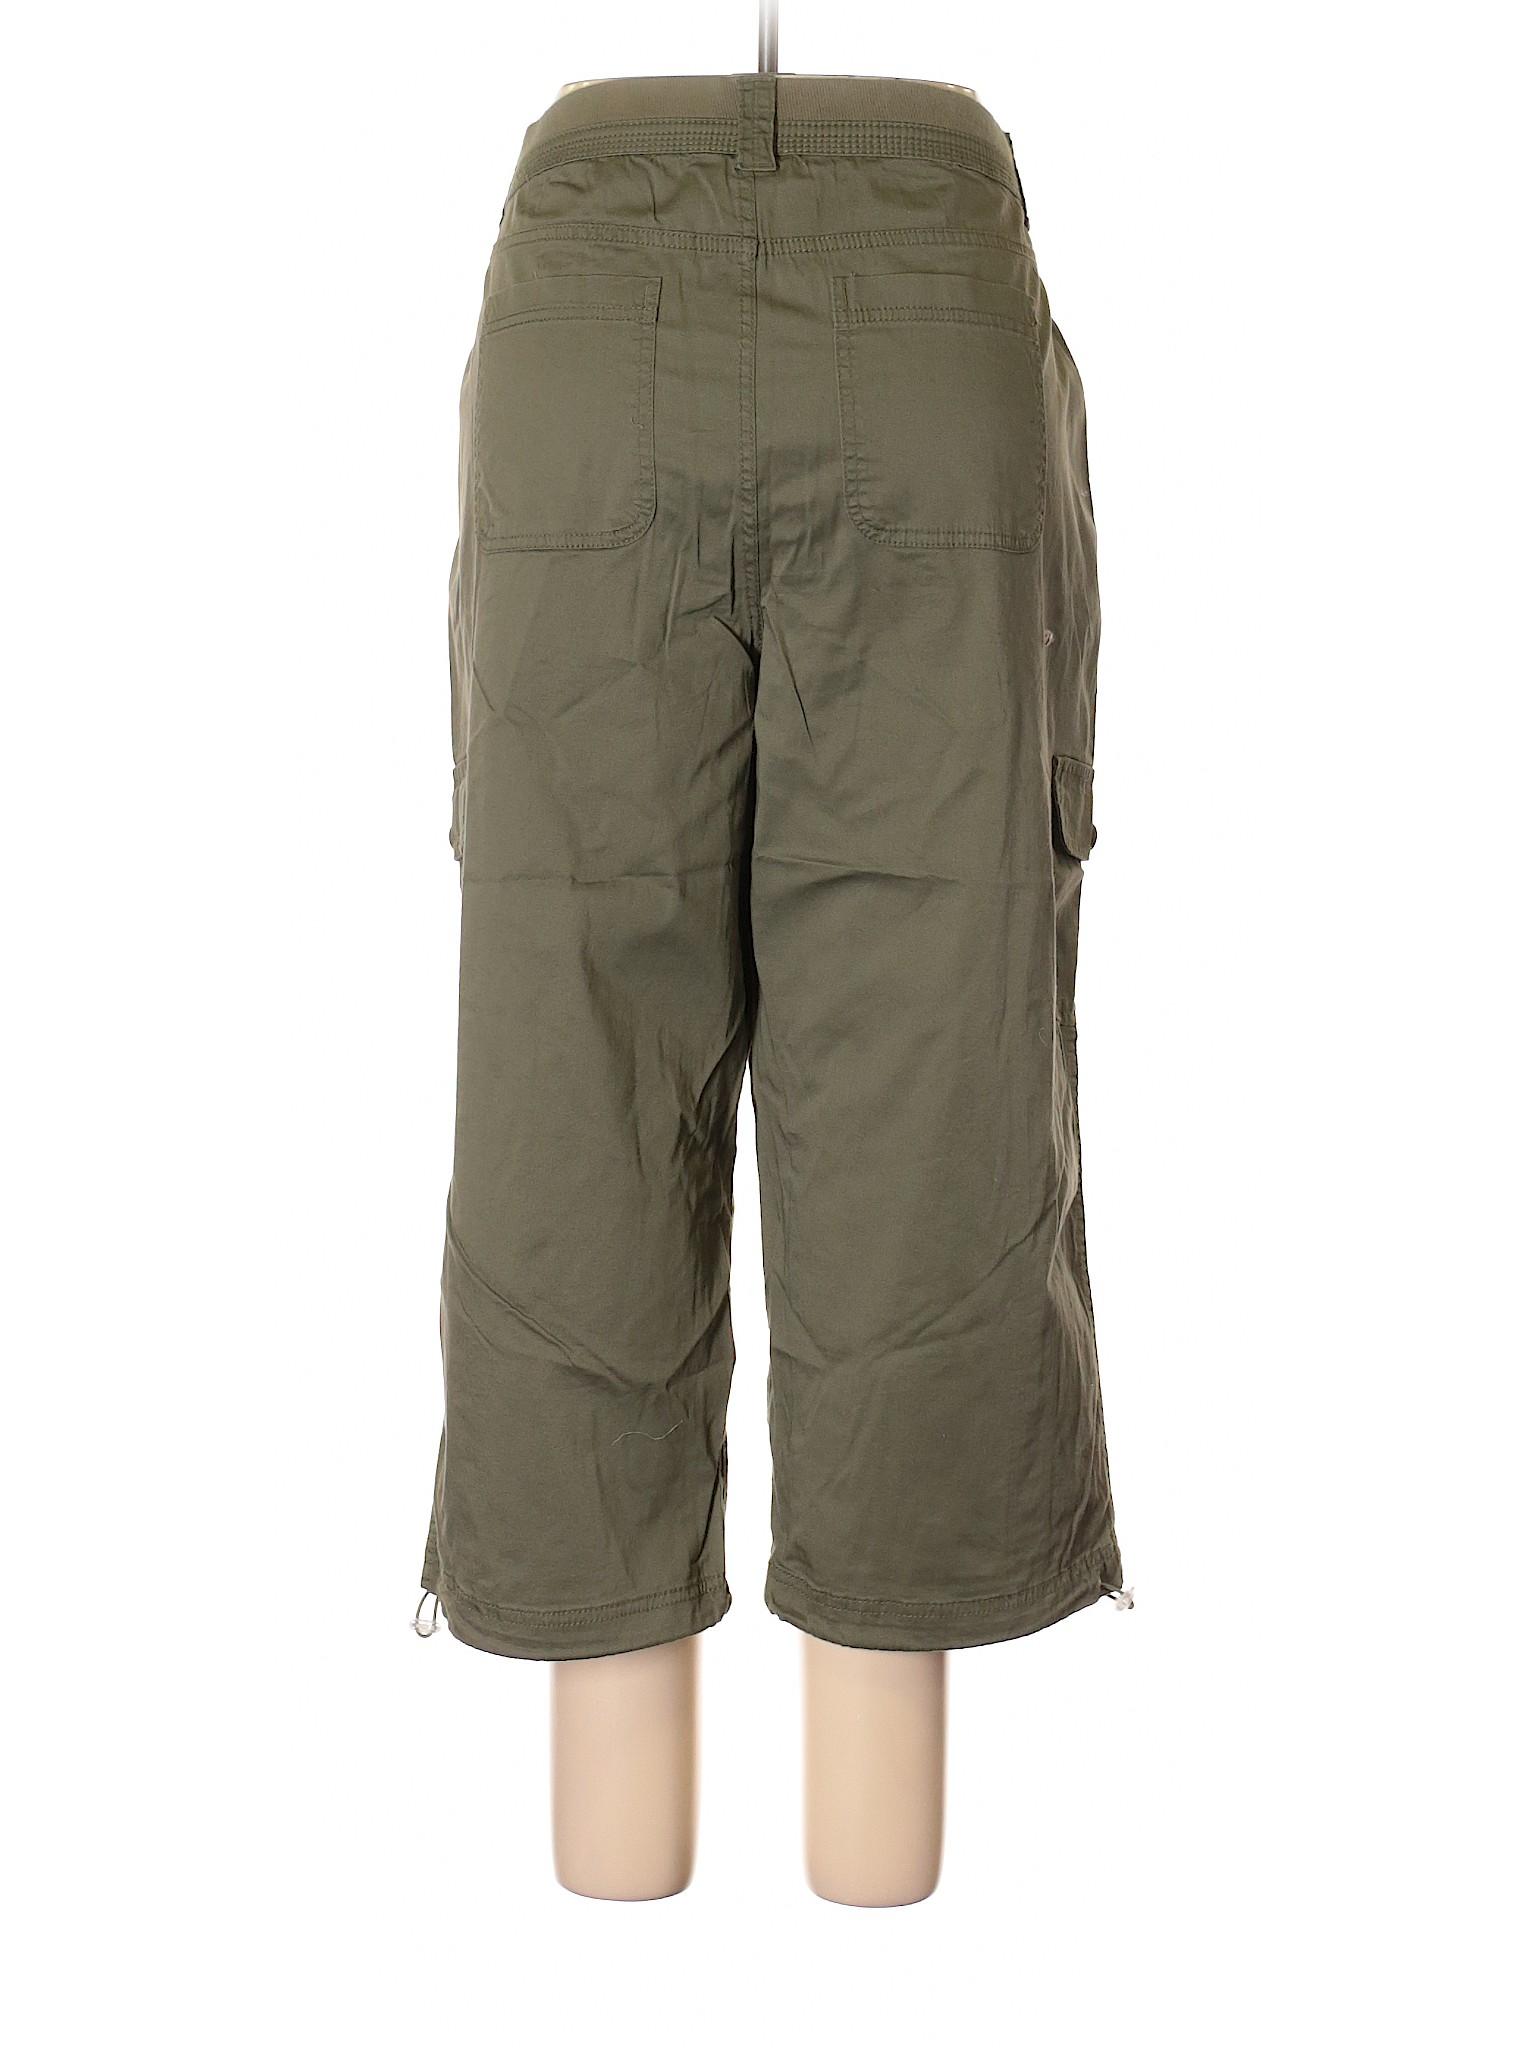 Style Cargo leisure amp;Co Pants Boutique PqY8Fwx